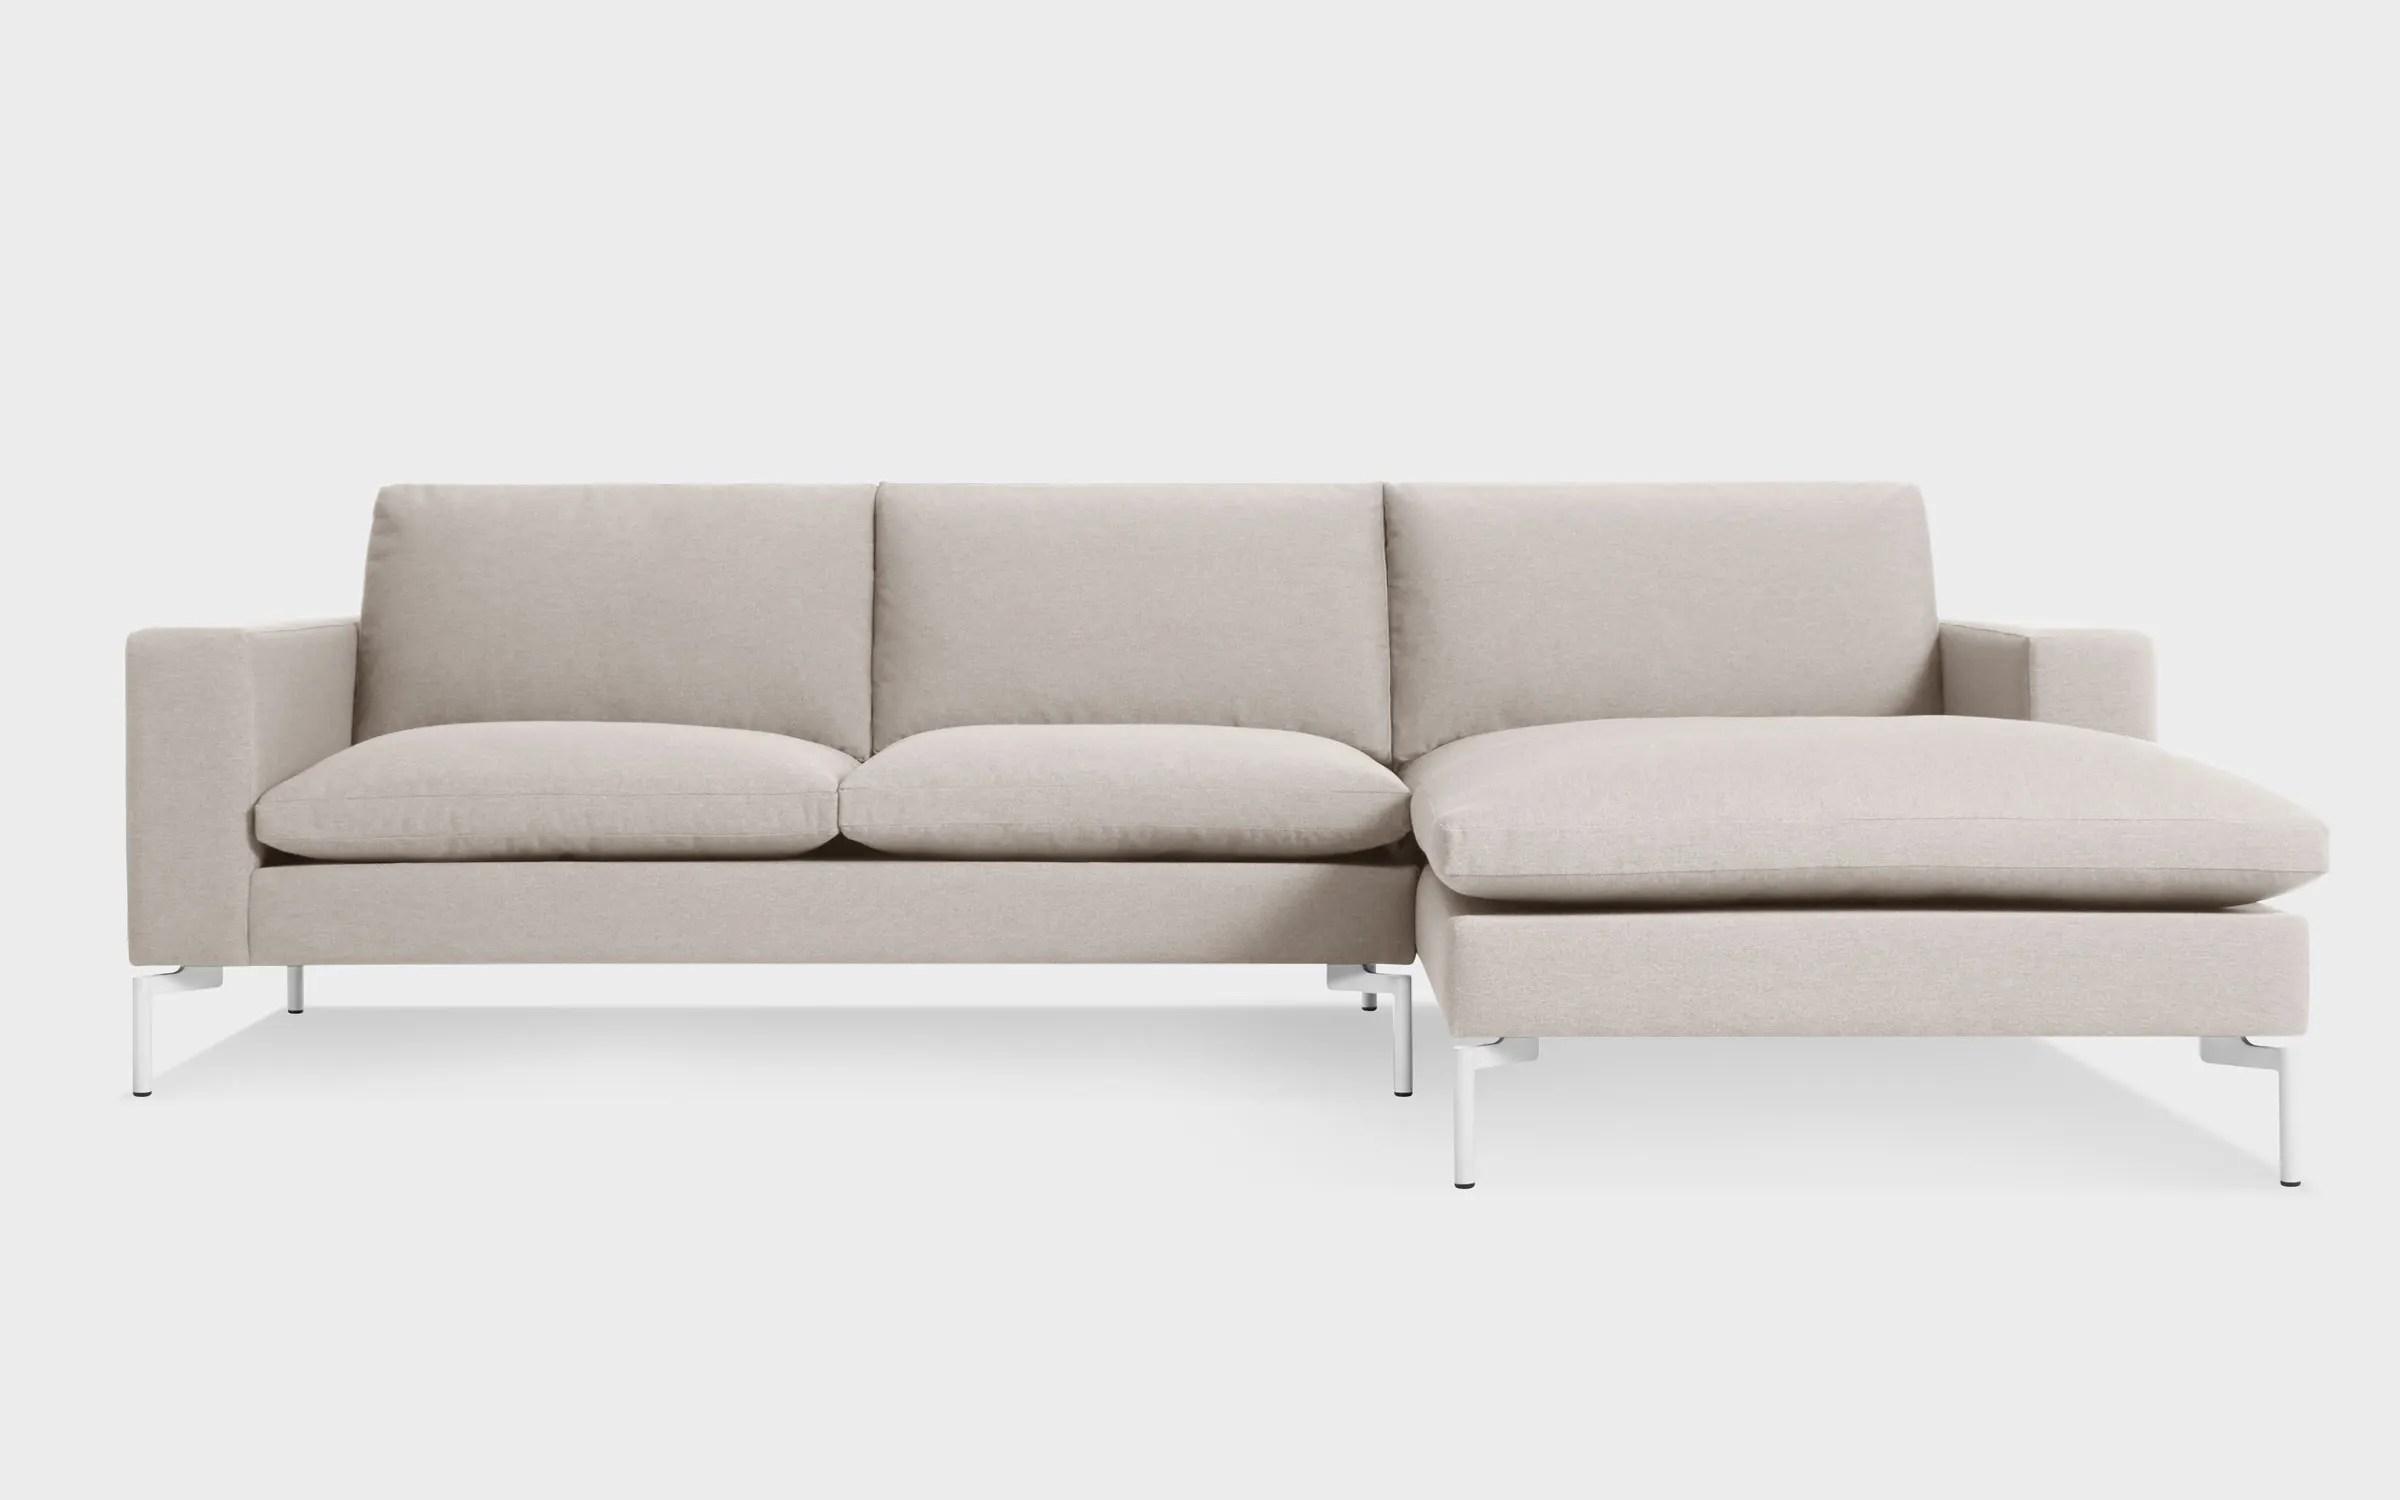 sofa w chaise jual cianjur new standard modern fabric right blu dot arm